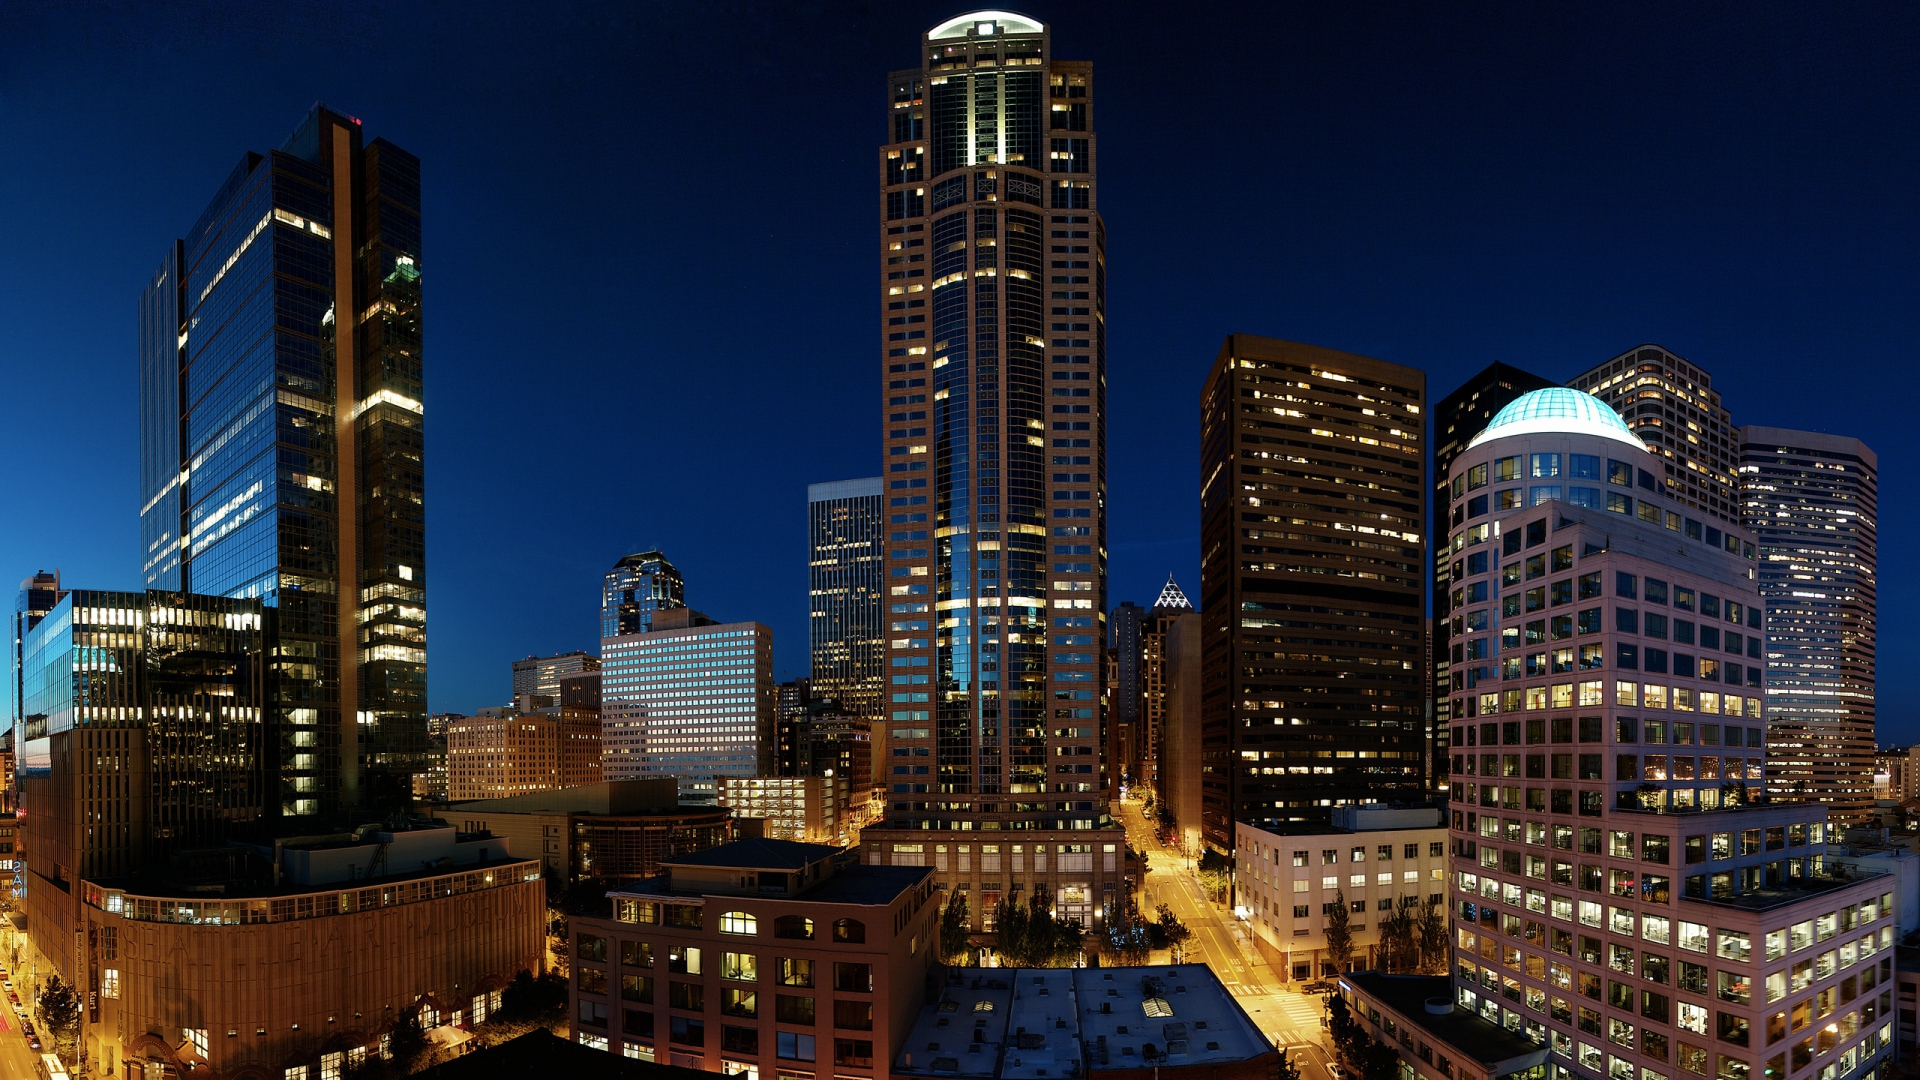 Download Wallpaper 1920x1080 Skyscrapers Night Seattle Full Hd 1080p Hd Background